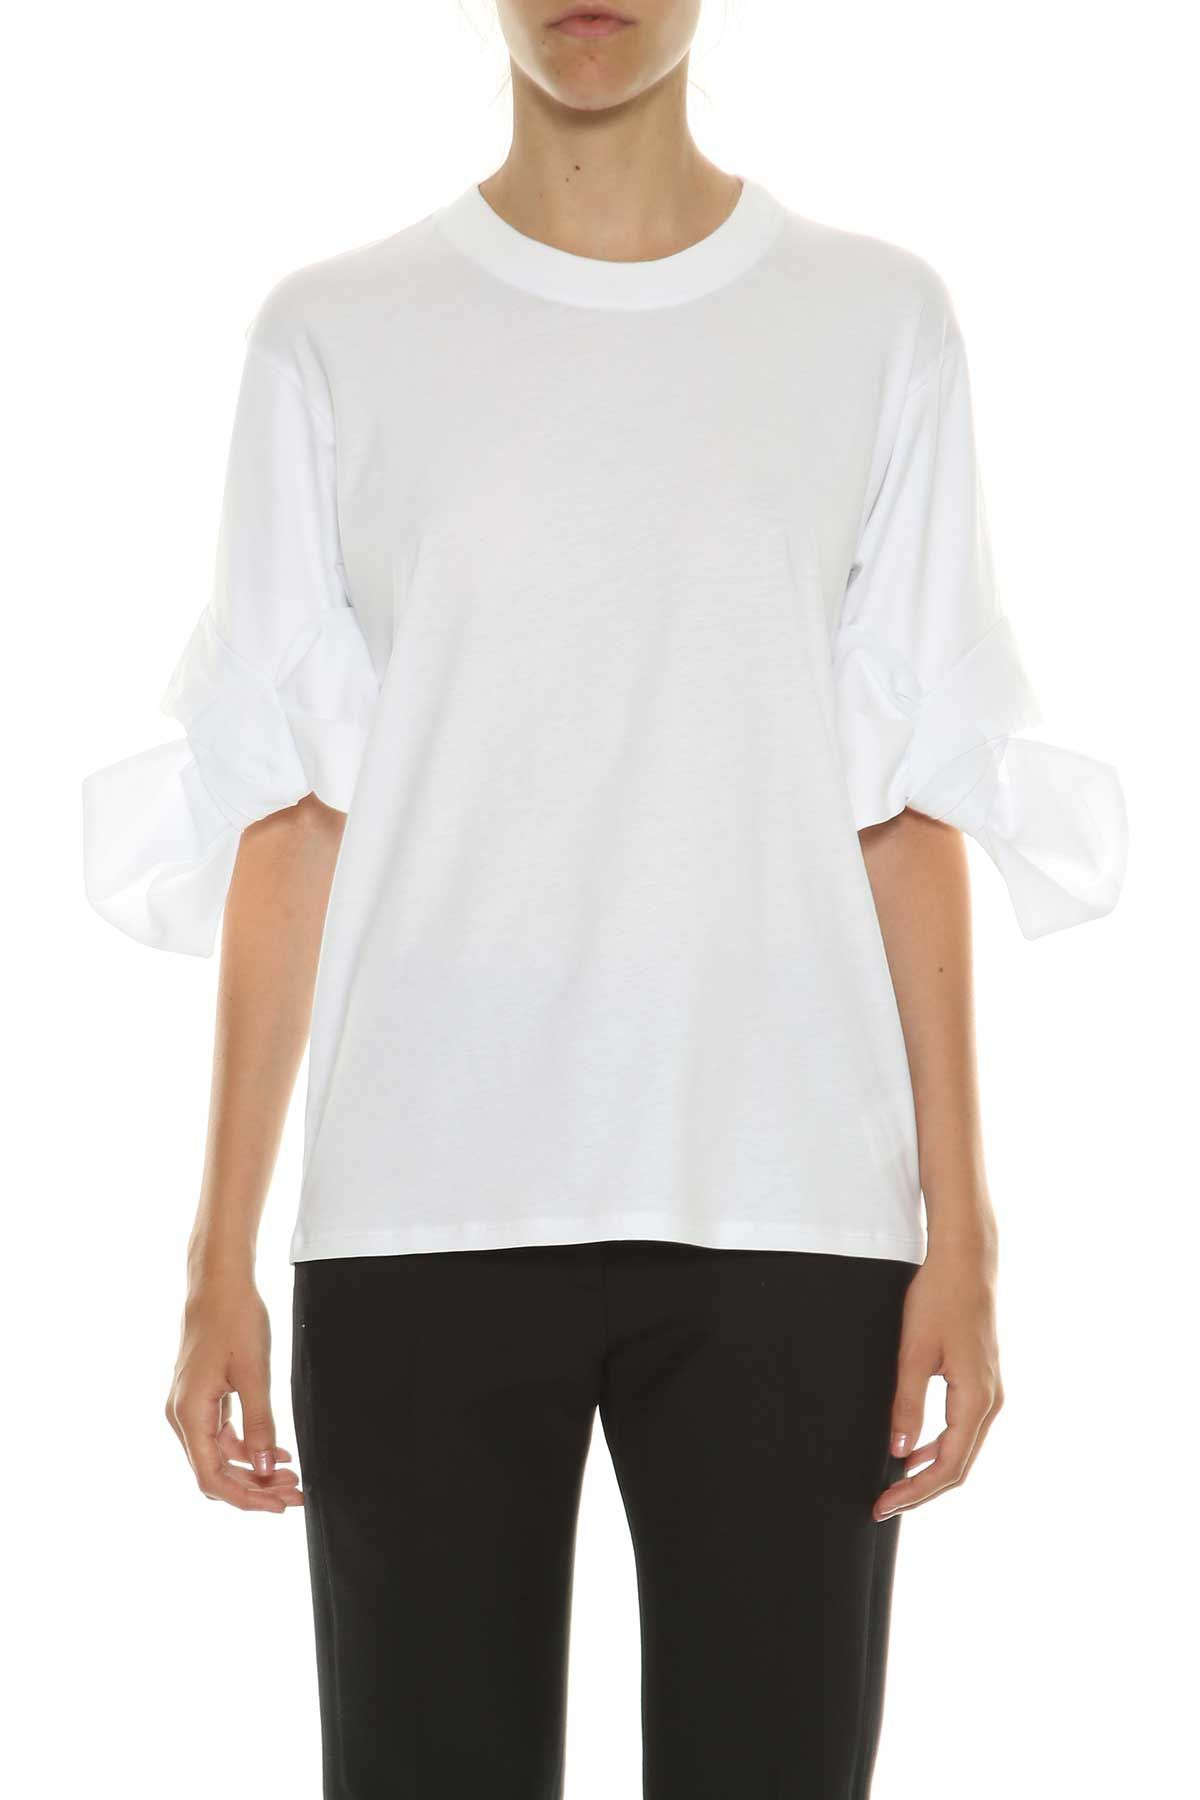 Victoria Victoria Beckham Bow Cuff T-shirt